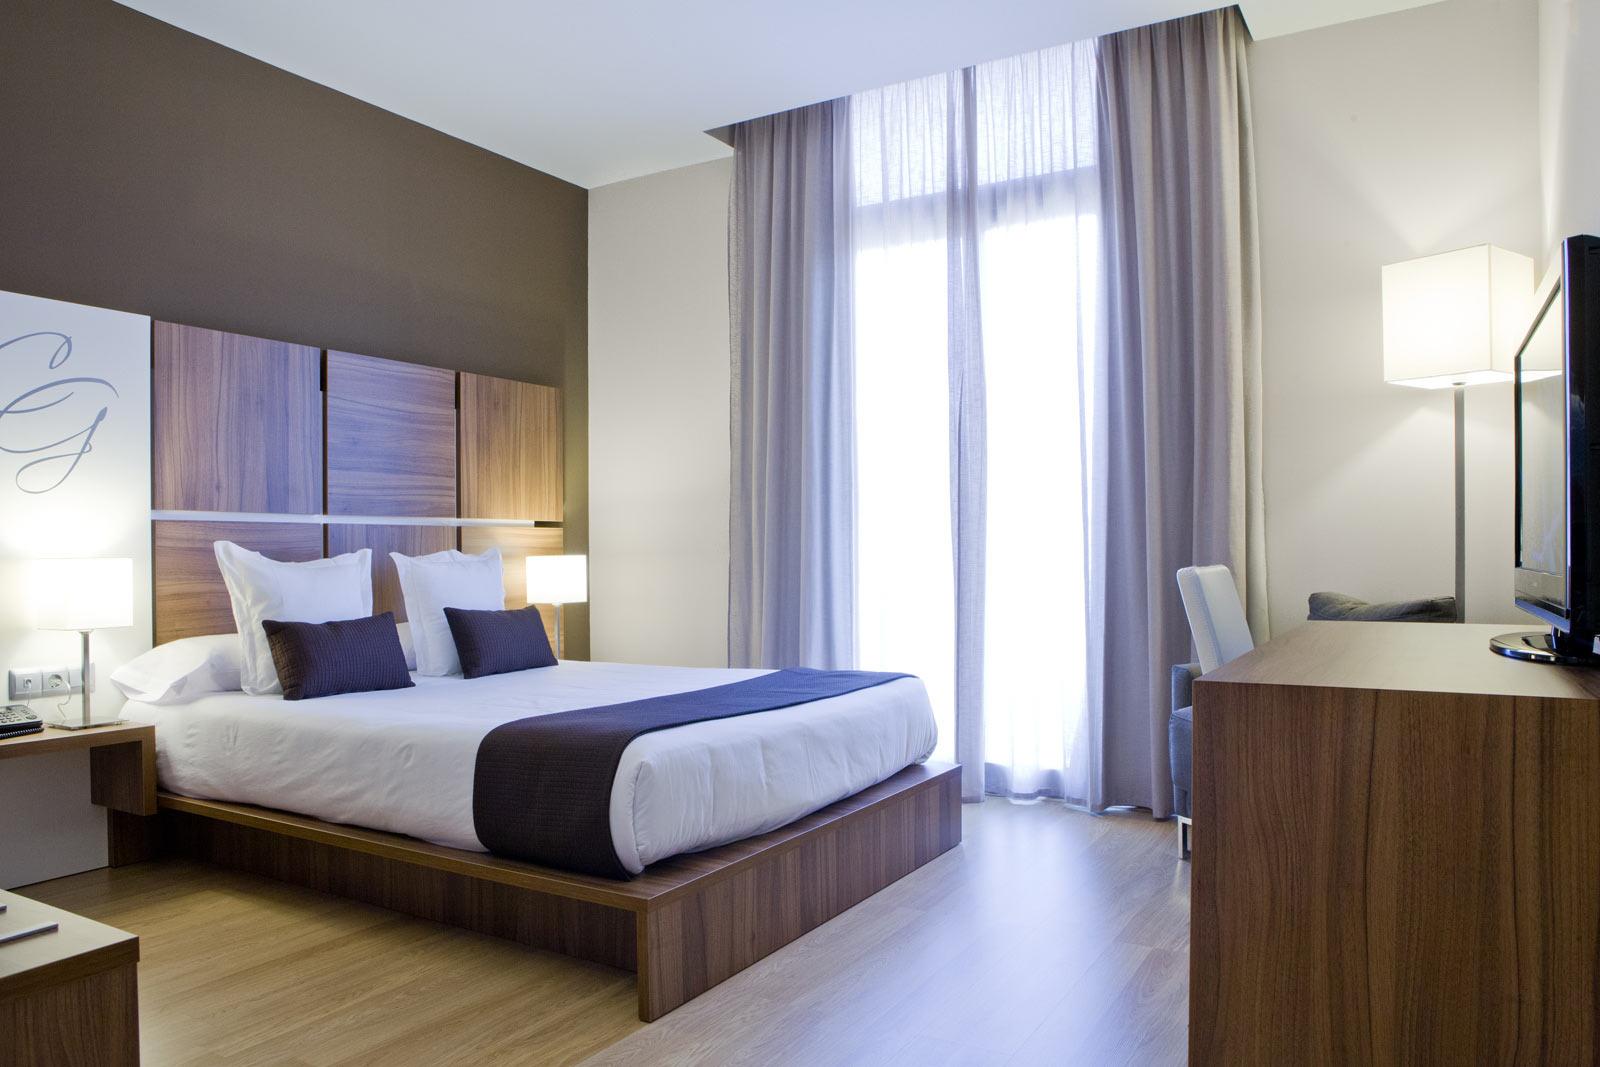 hotel_8843_1600x1067